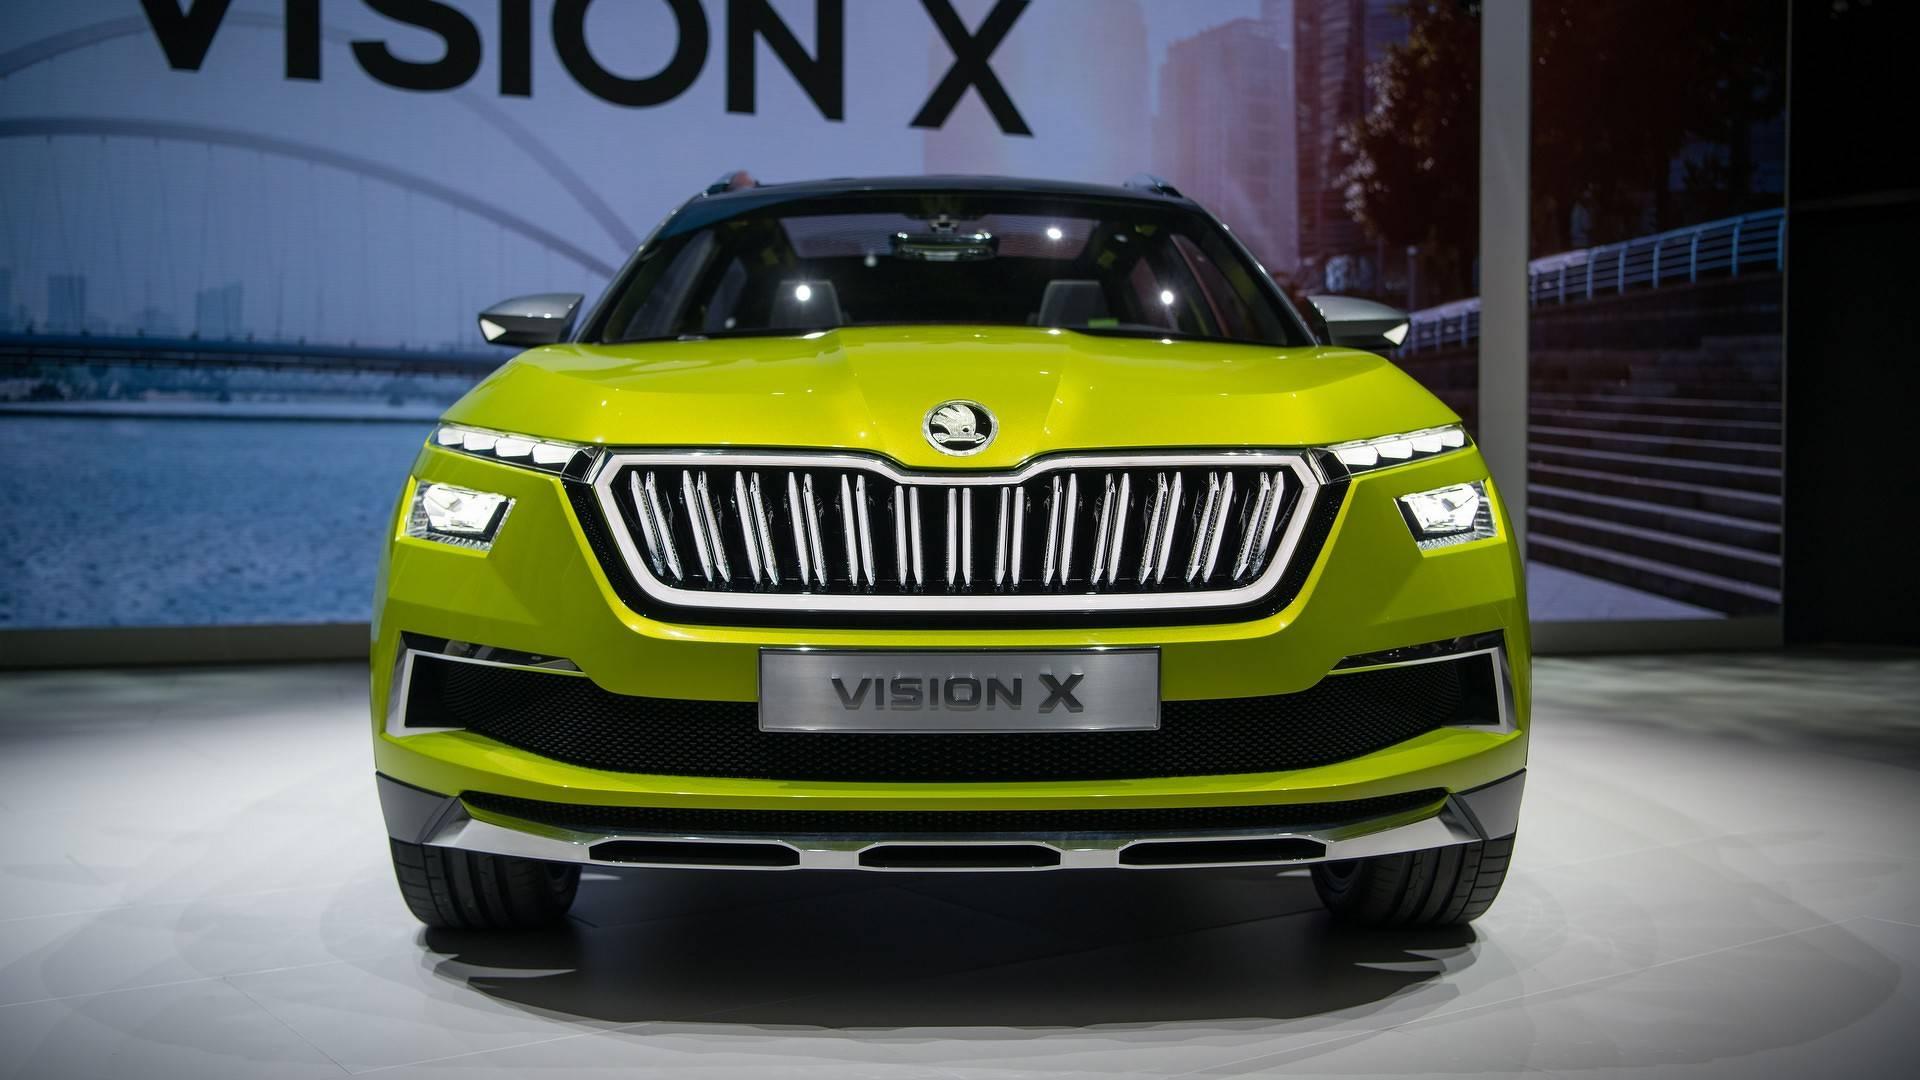 2018-skoda-vision-x-concept (1)